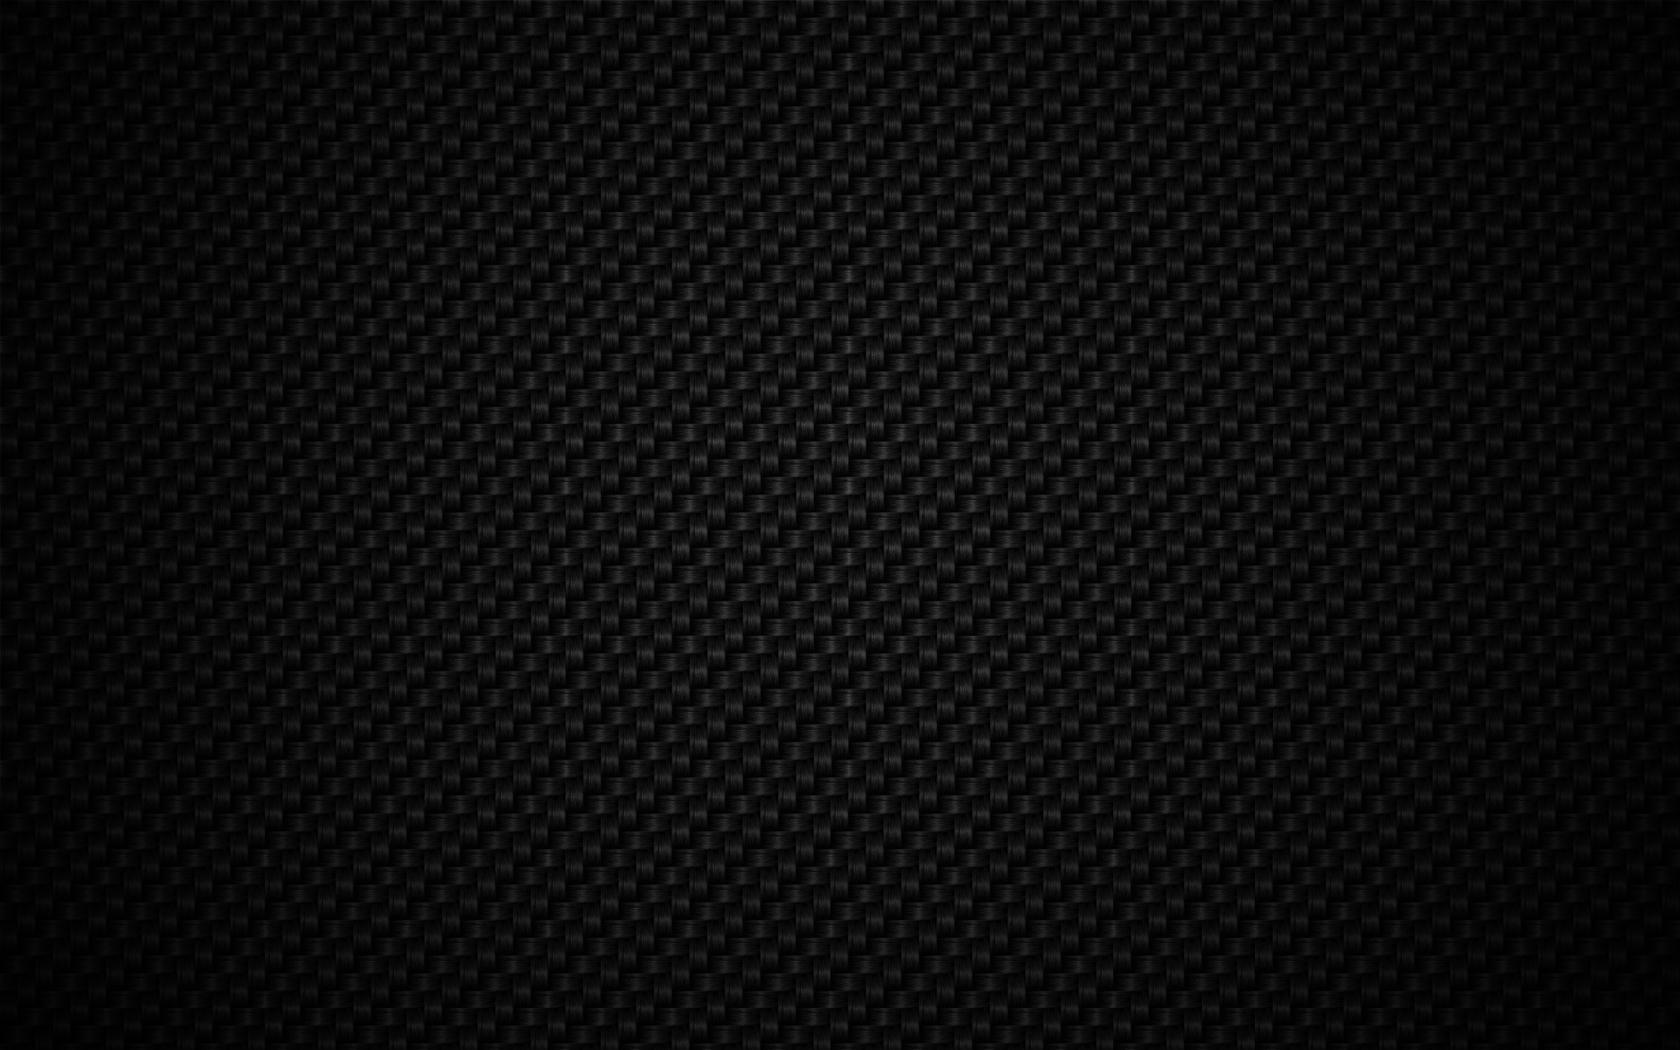 carbon fine weave hd wallpapers Cronic Customs 1680x1050